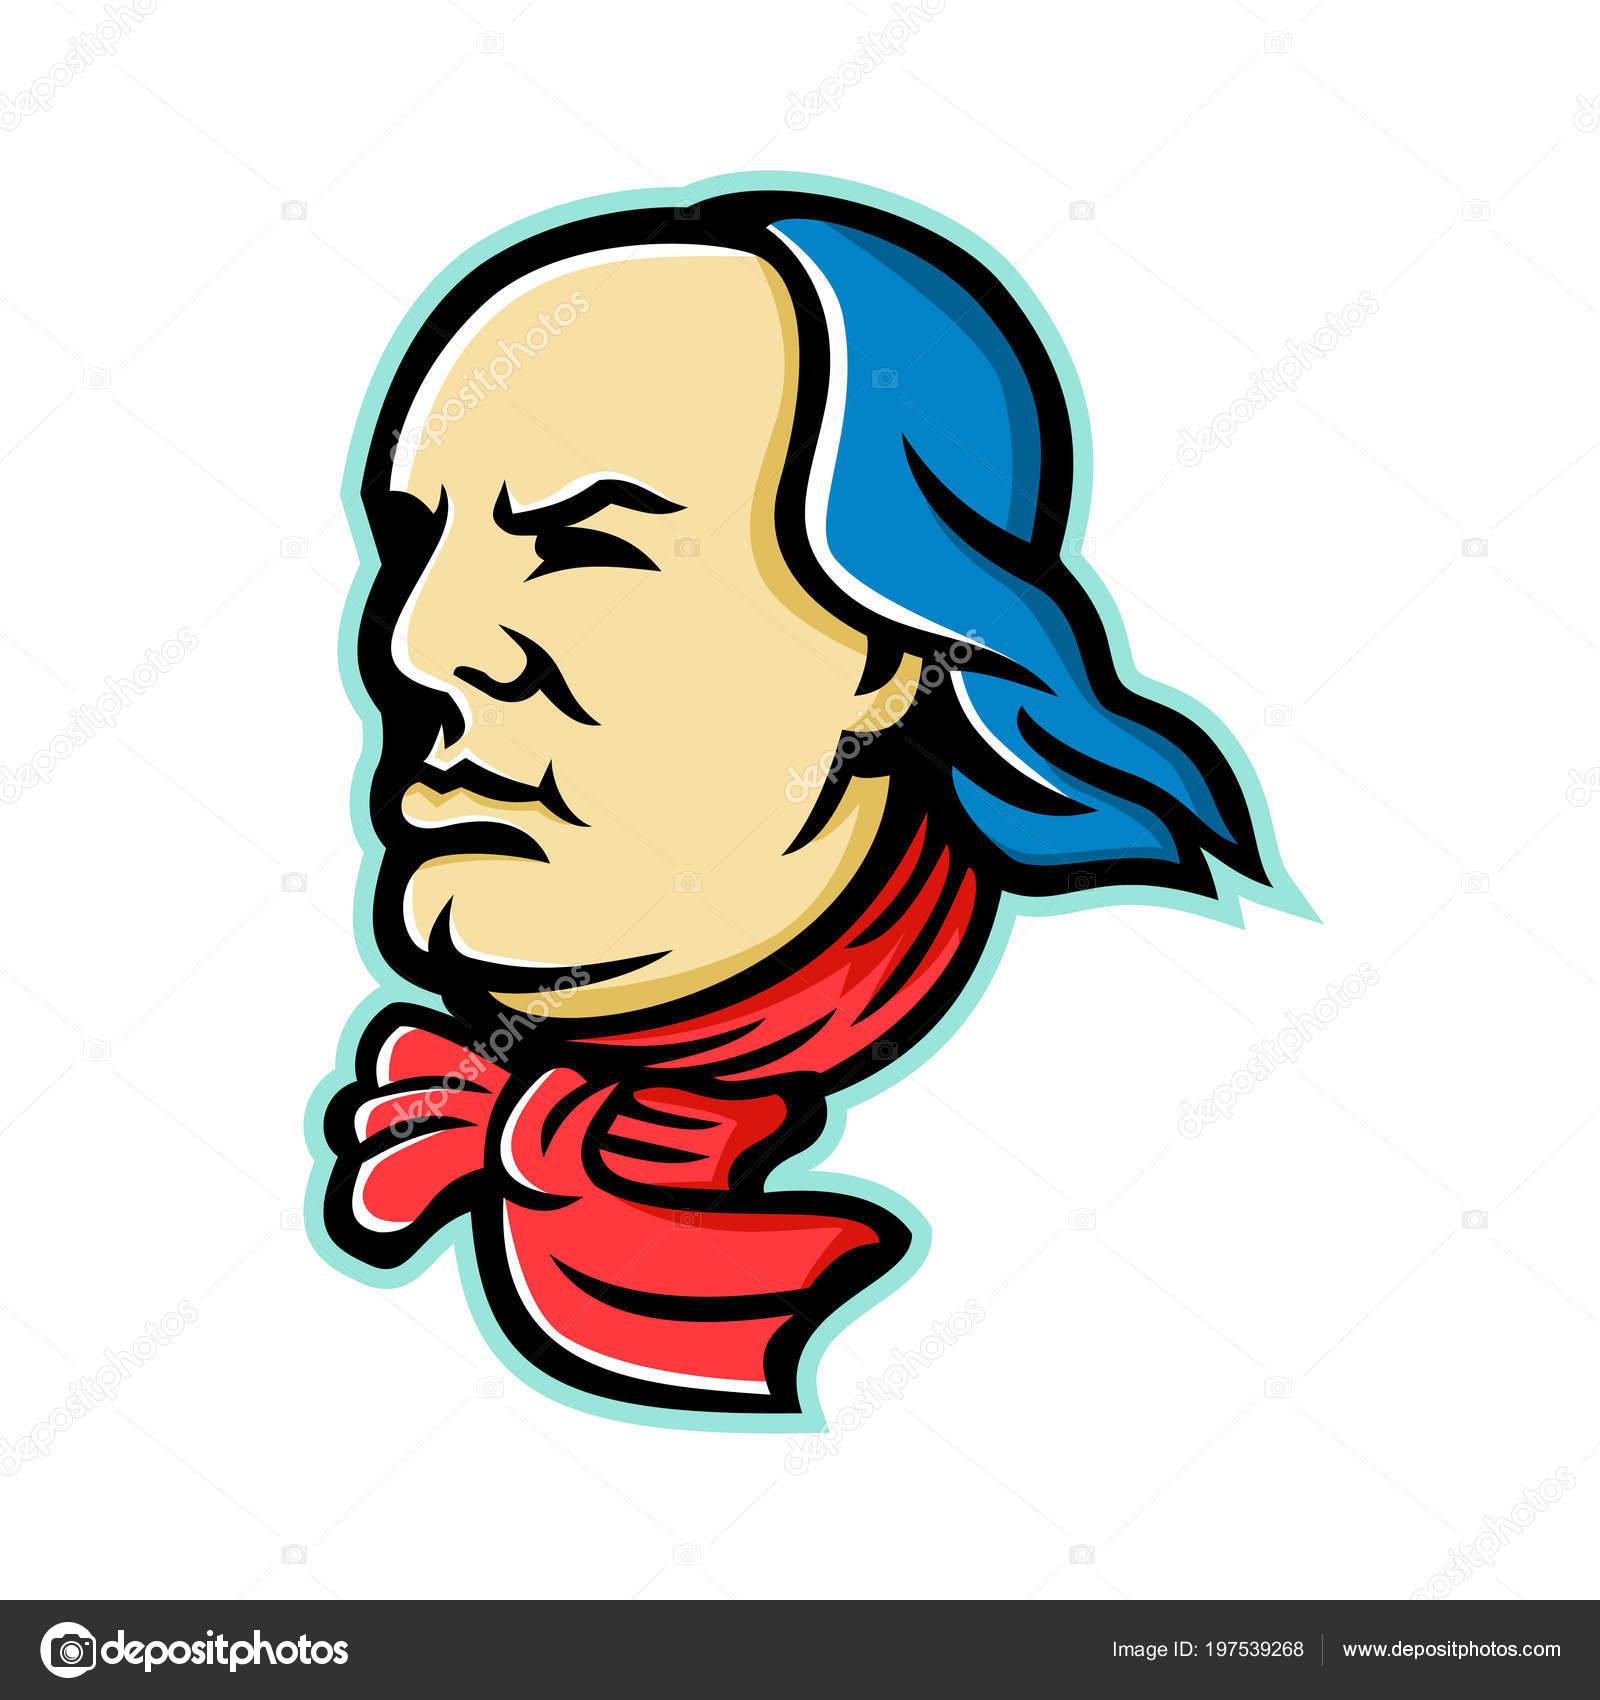 ᐈ Benjamin franklin clip art stock images, Royalty Free ben franklin  pictures | download on Depositphotos®